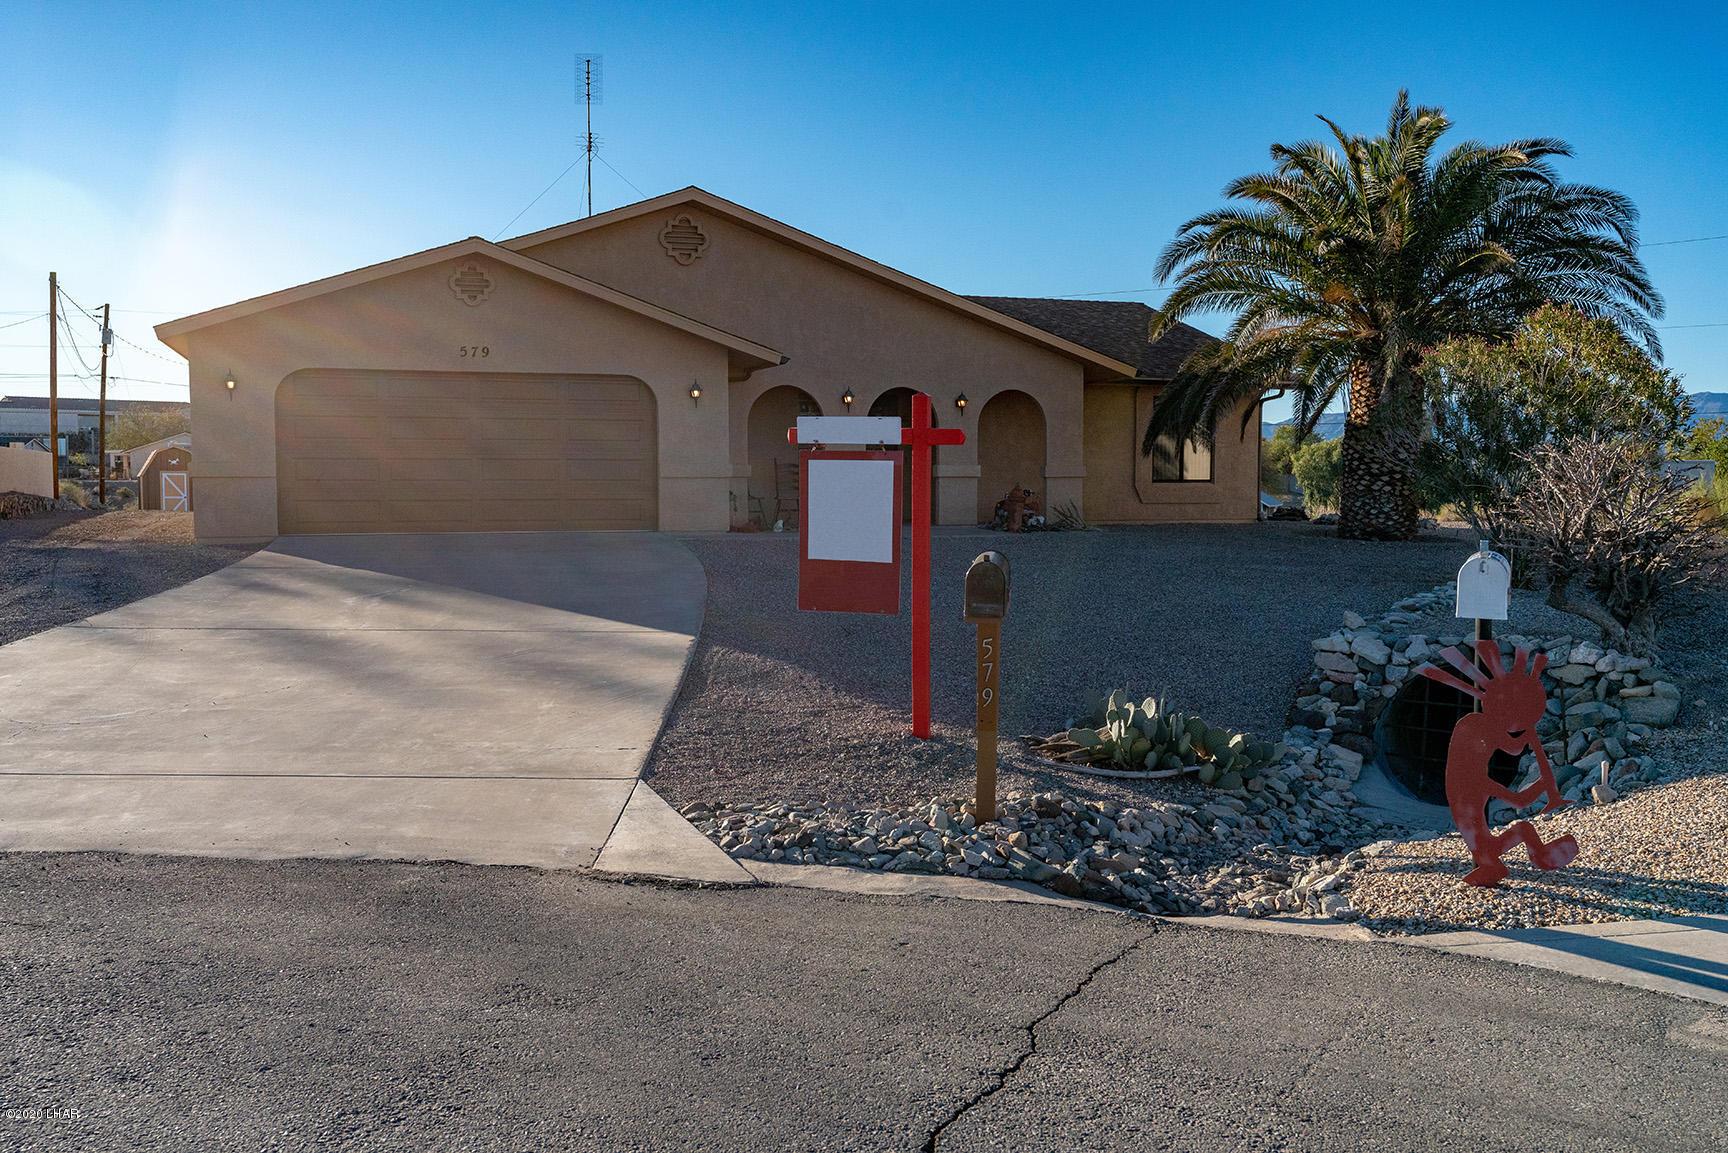 Details for 579 Robin, Lake Havasu City, AZ 86403